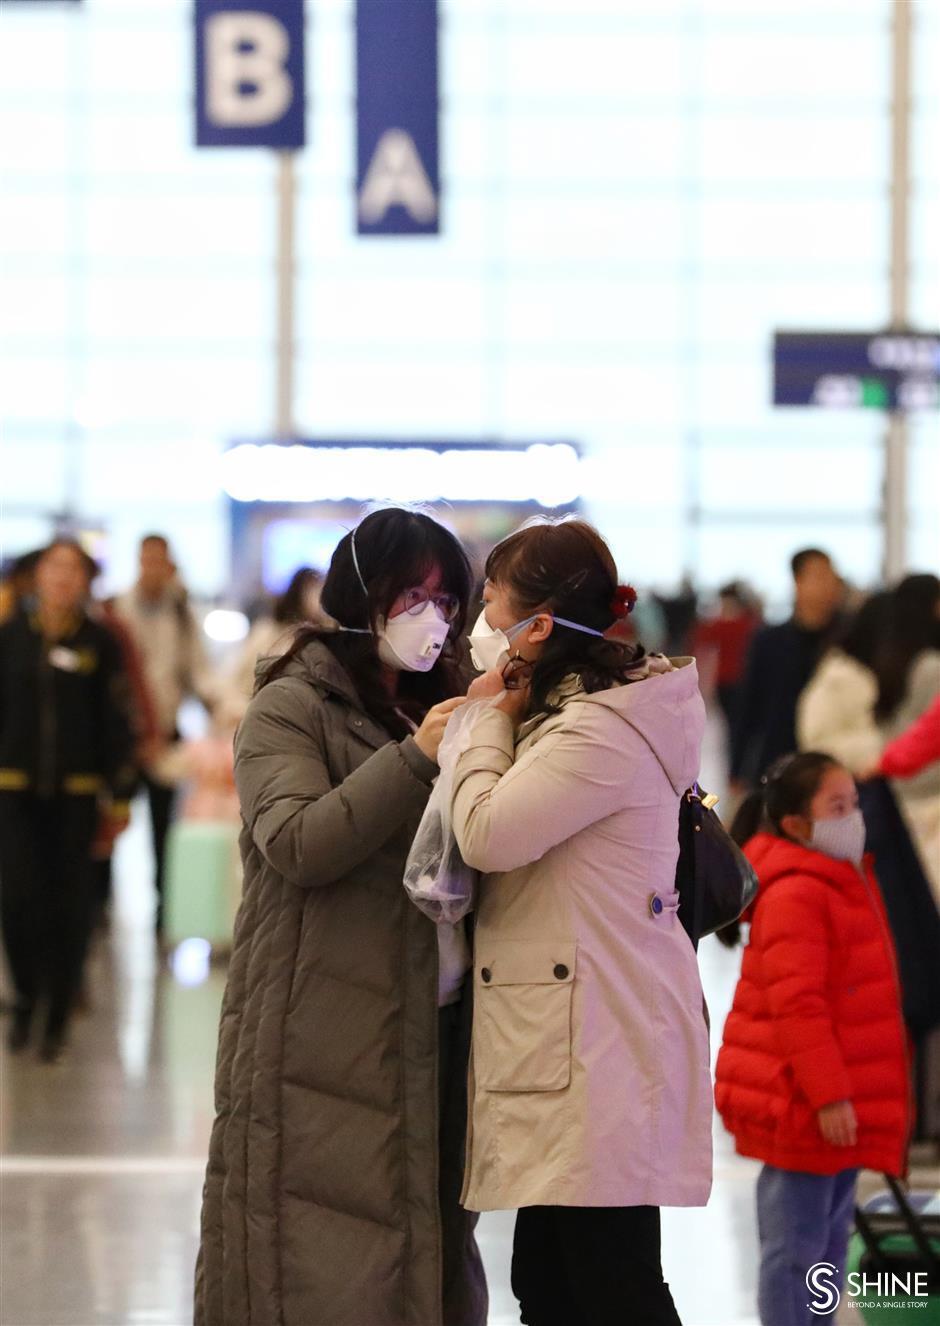 Shanghai starts checking passengers' temperatures at transport hubs